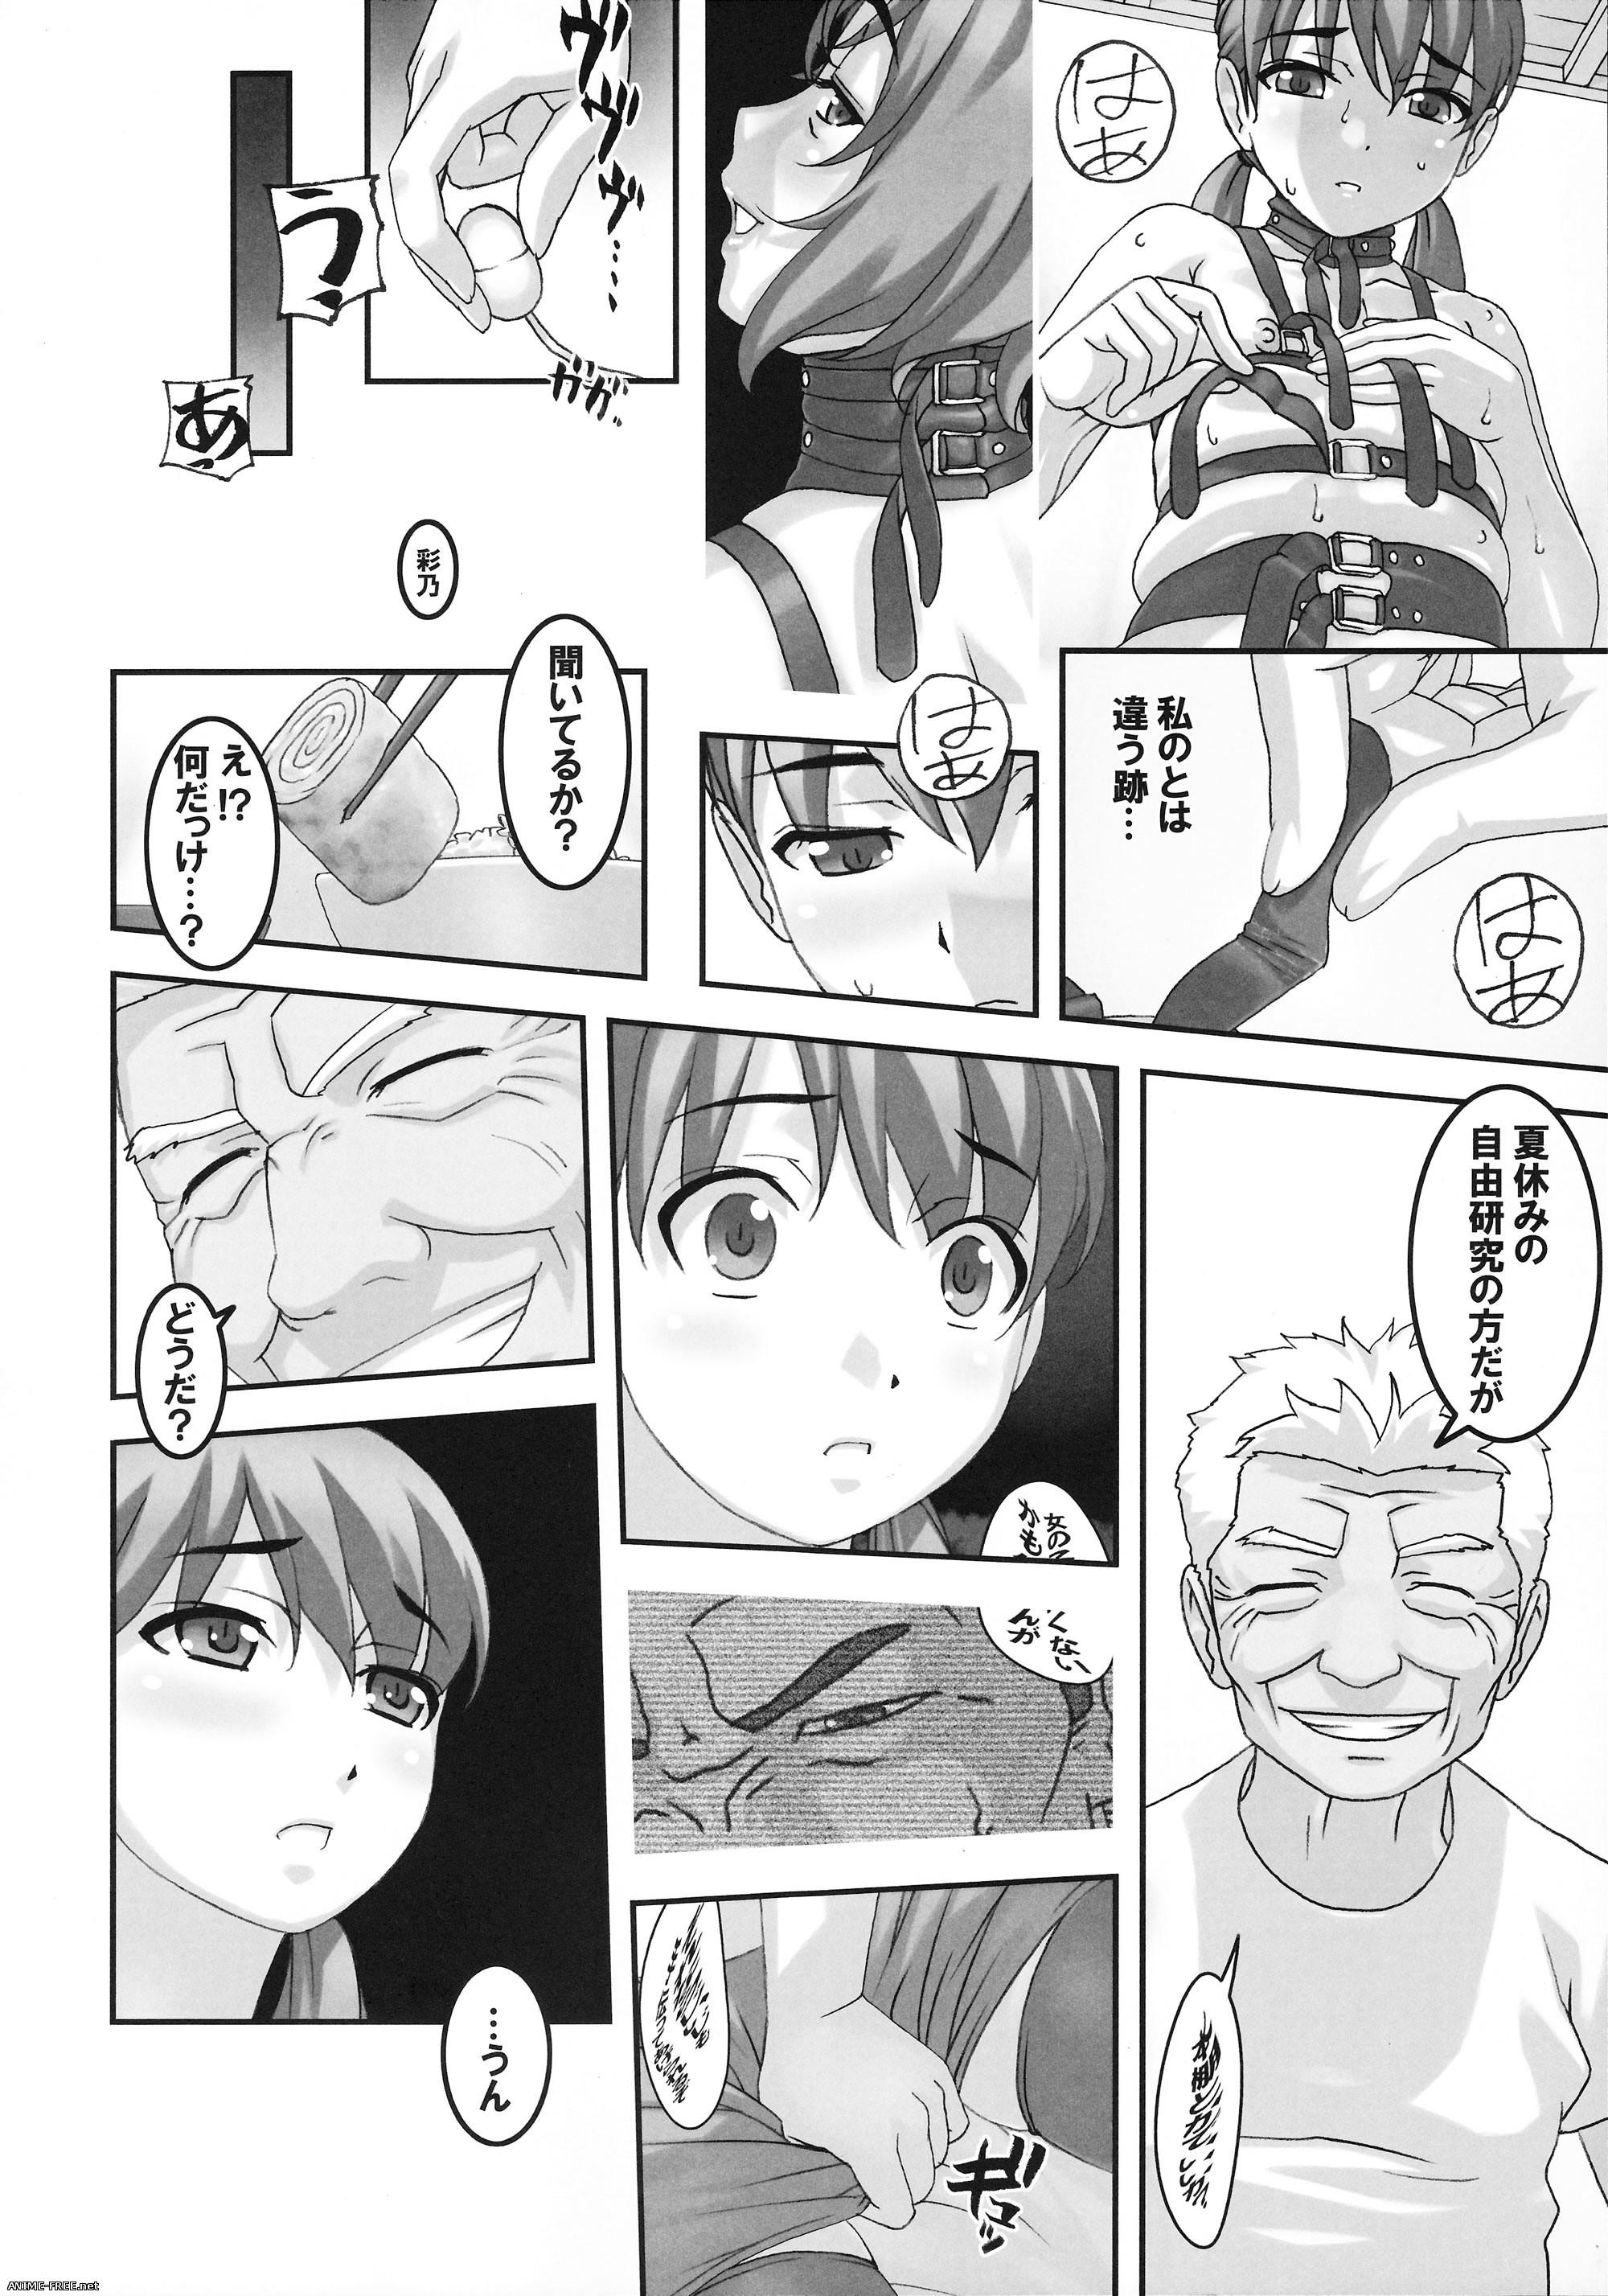 Sakura Romako / Tairiku Kan Dandoudan-dan / Saromako - Сборник хентай манги [Cen] [JAP,ENG,RUS] Manga Hentai